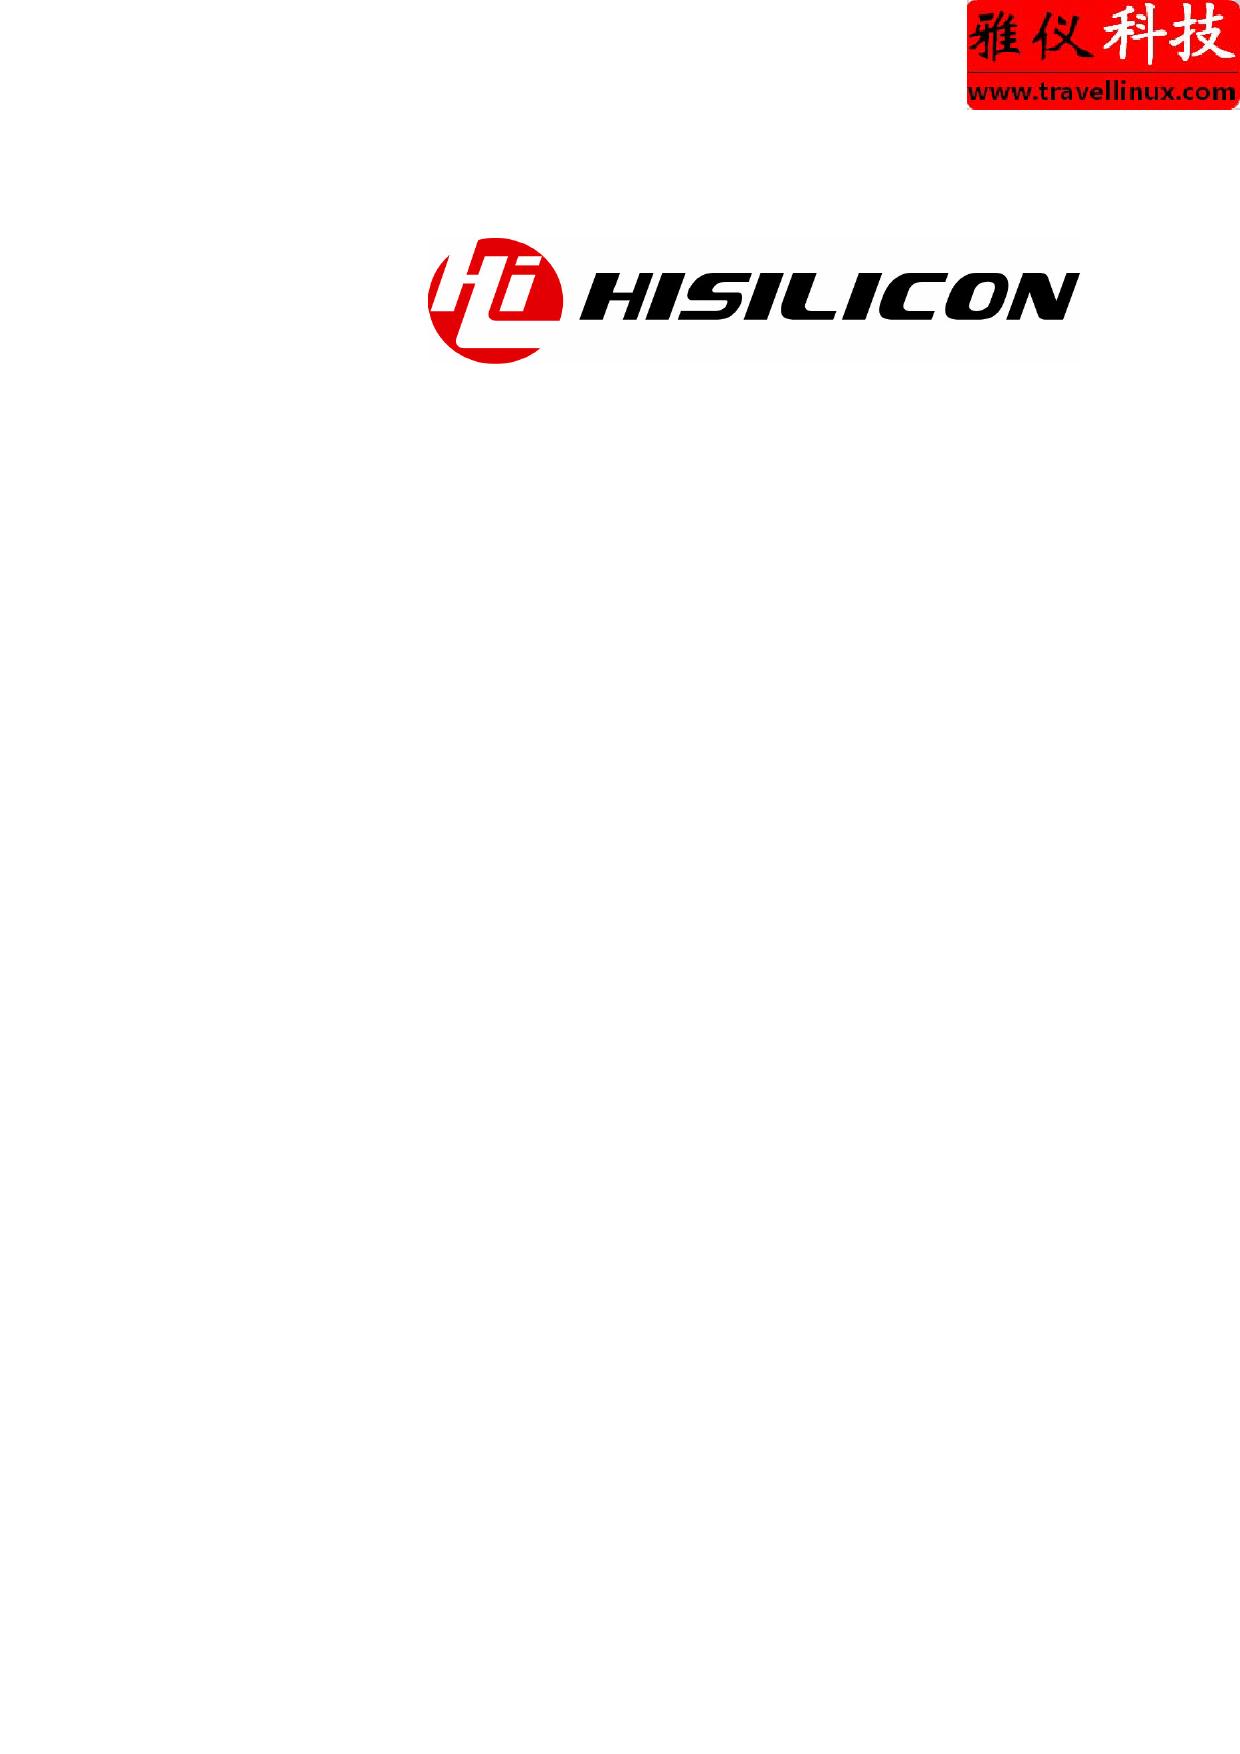 Hi3516 image